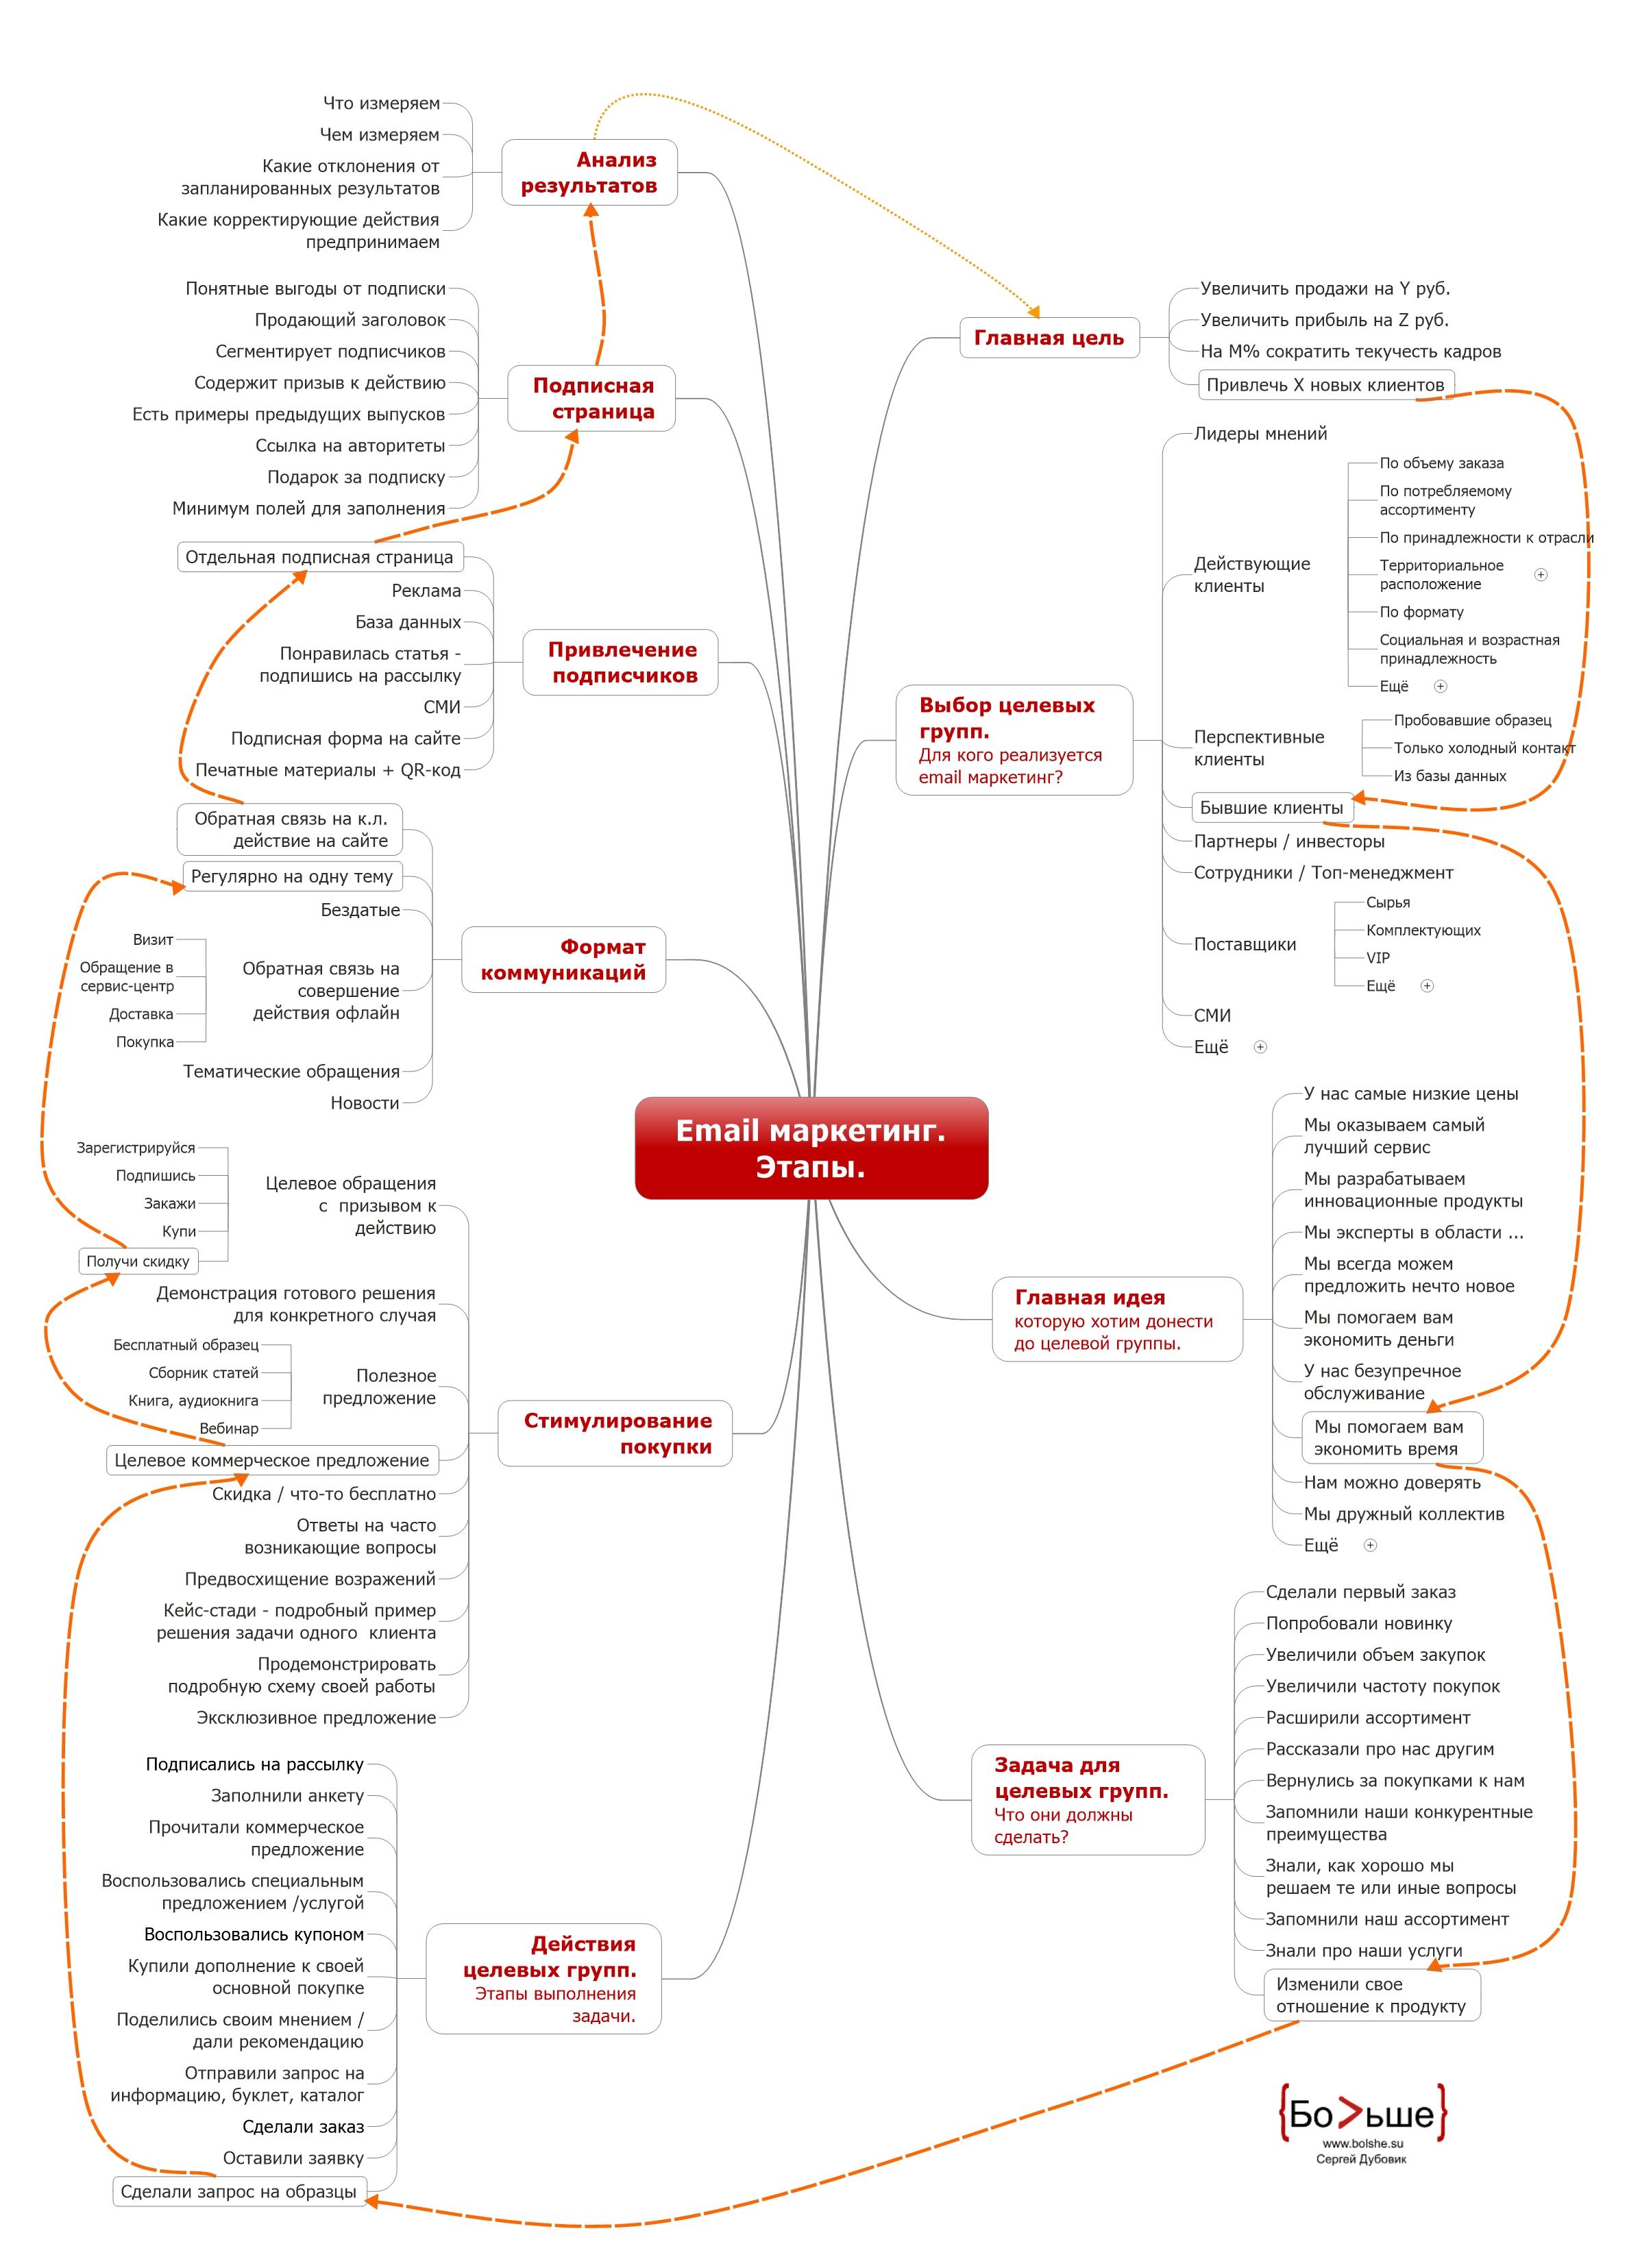 Email маркетинг. Этапы реализации.